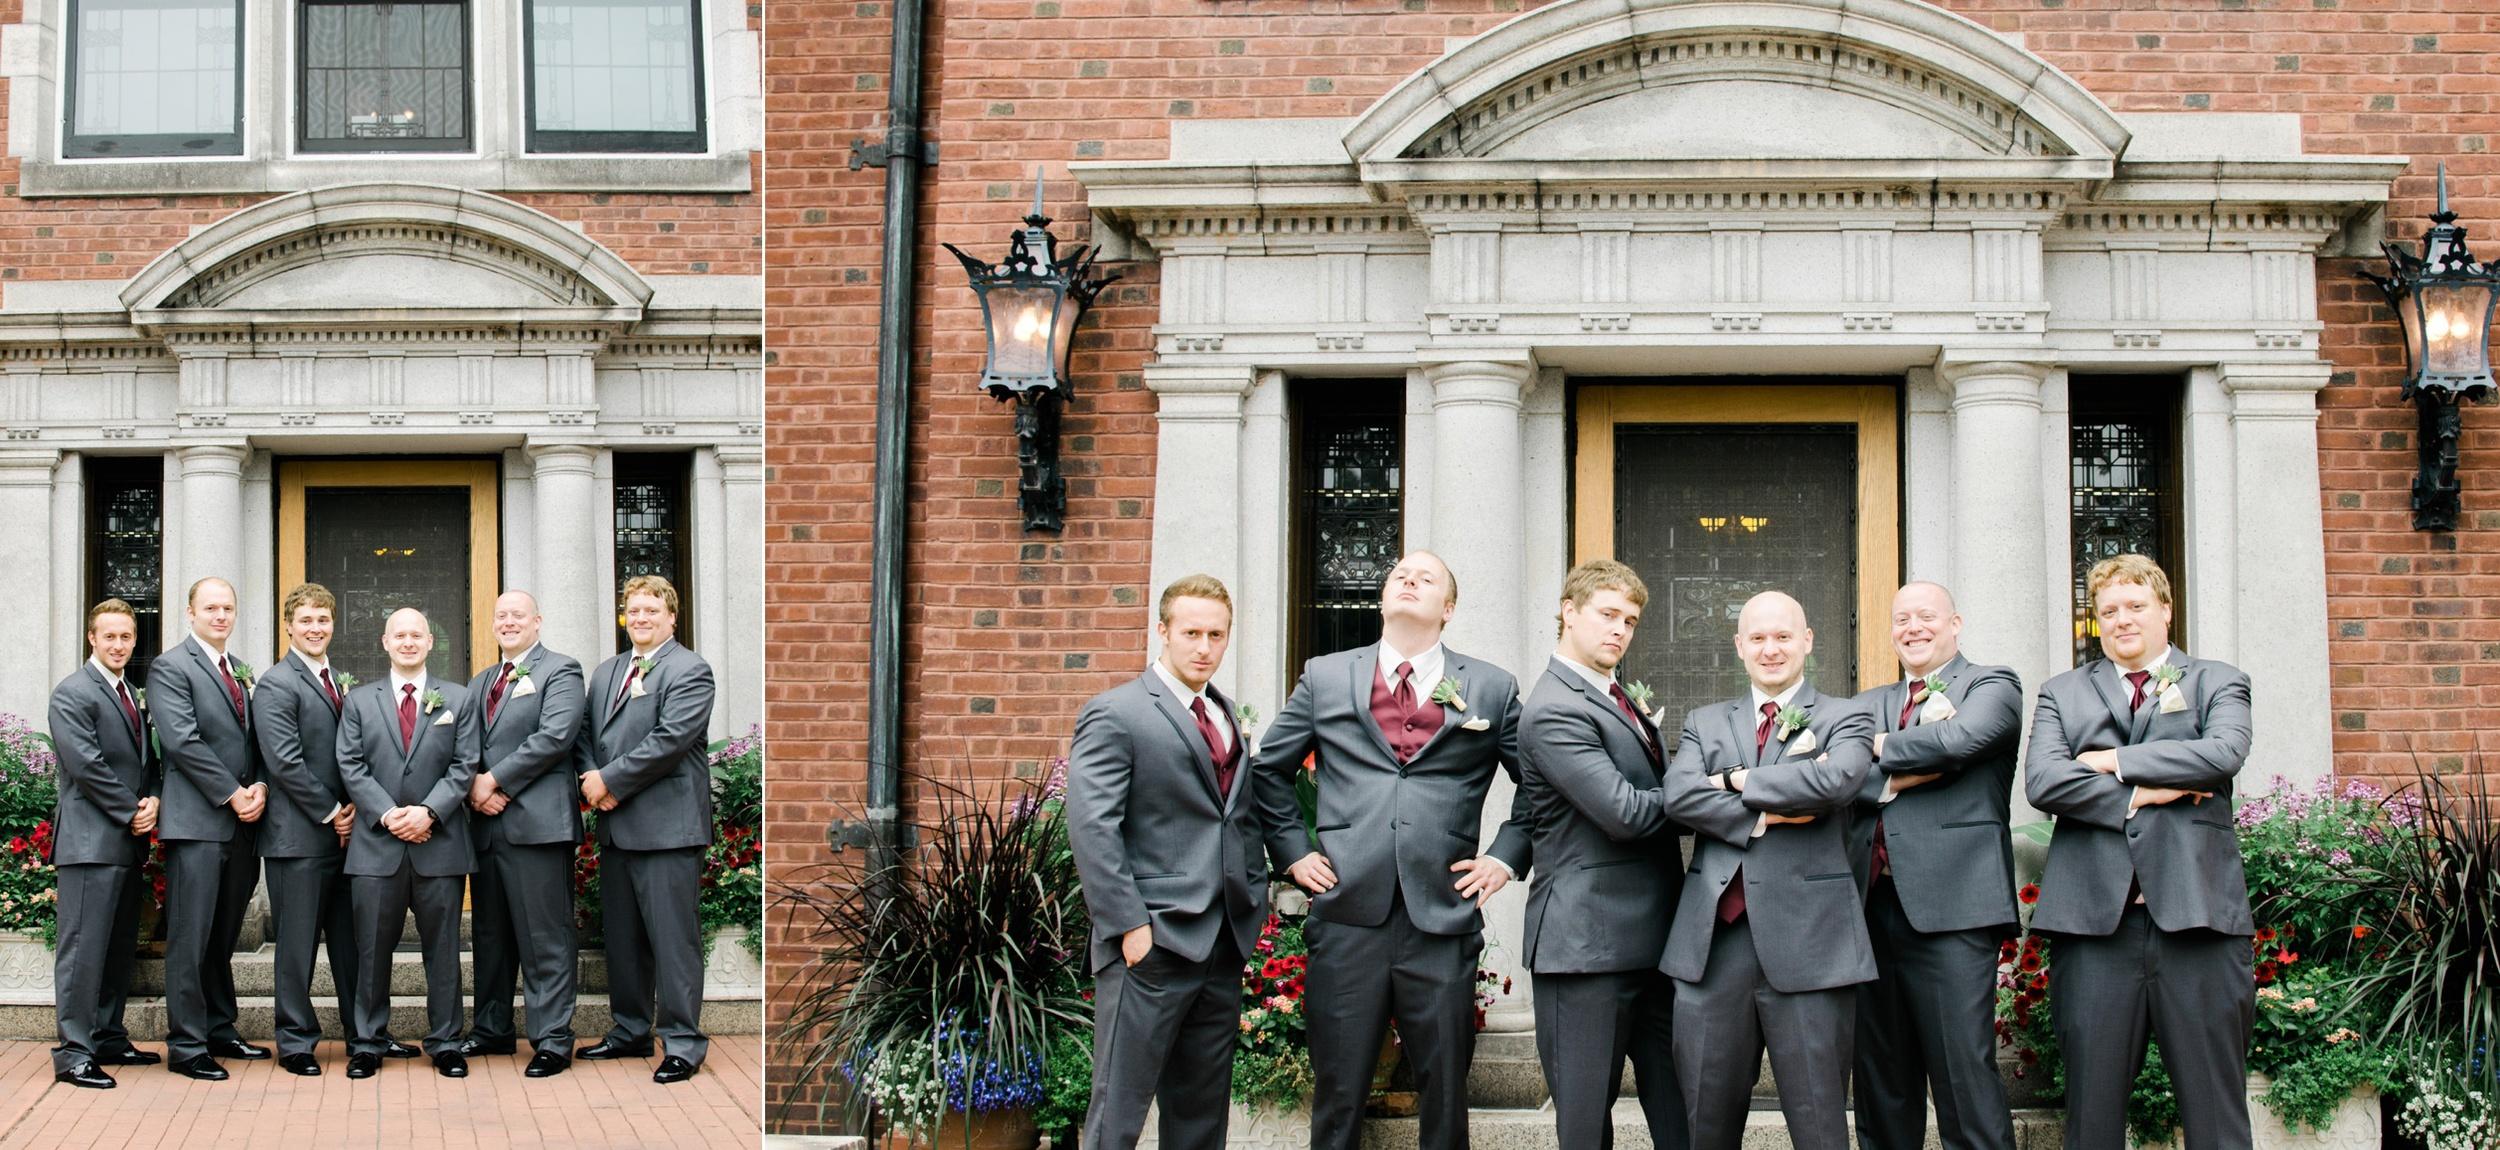 Glensheen Mansion Wedding | Duluth, MN Wedding Photographer_0481.jpg